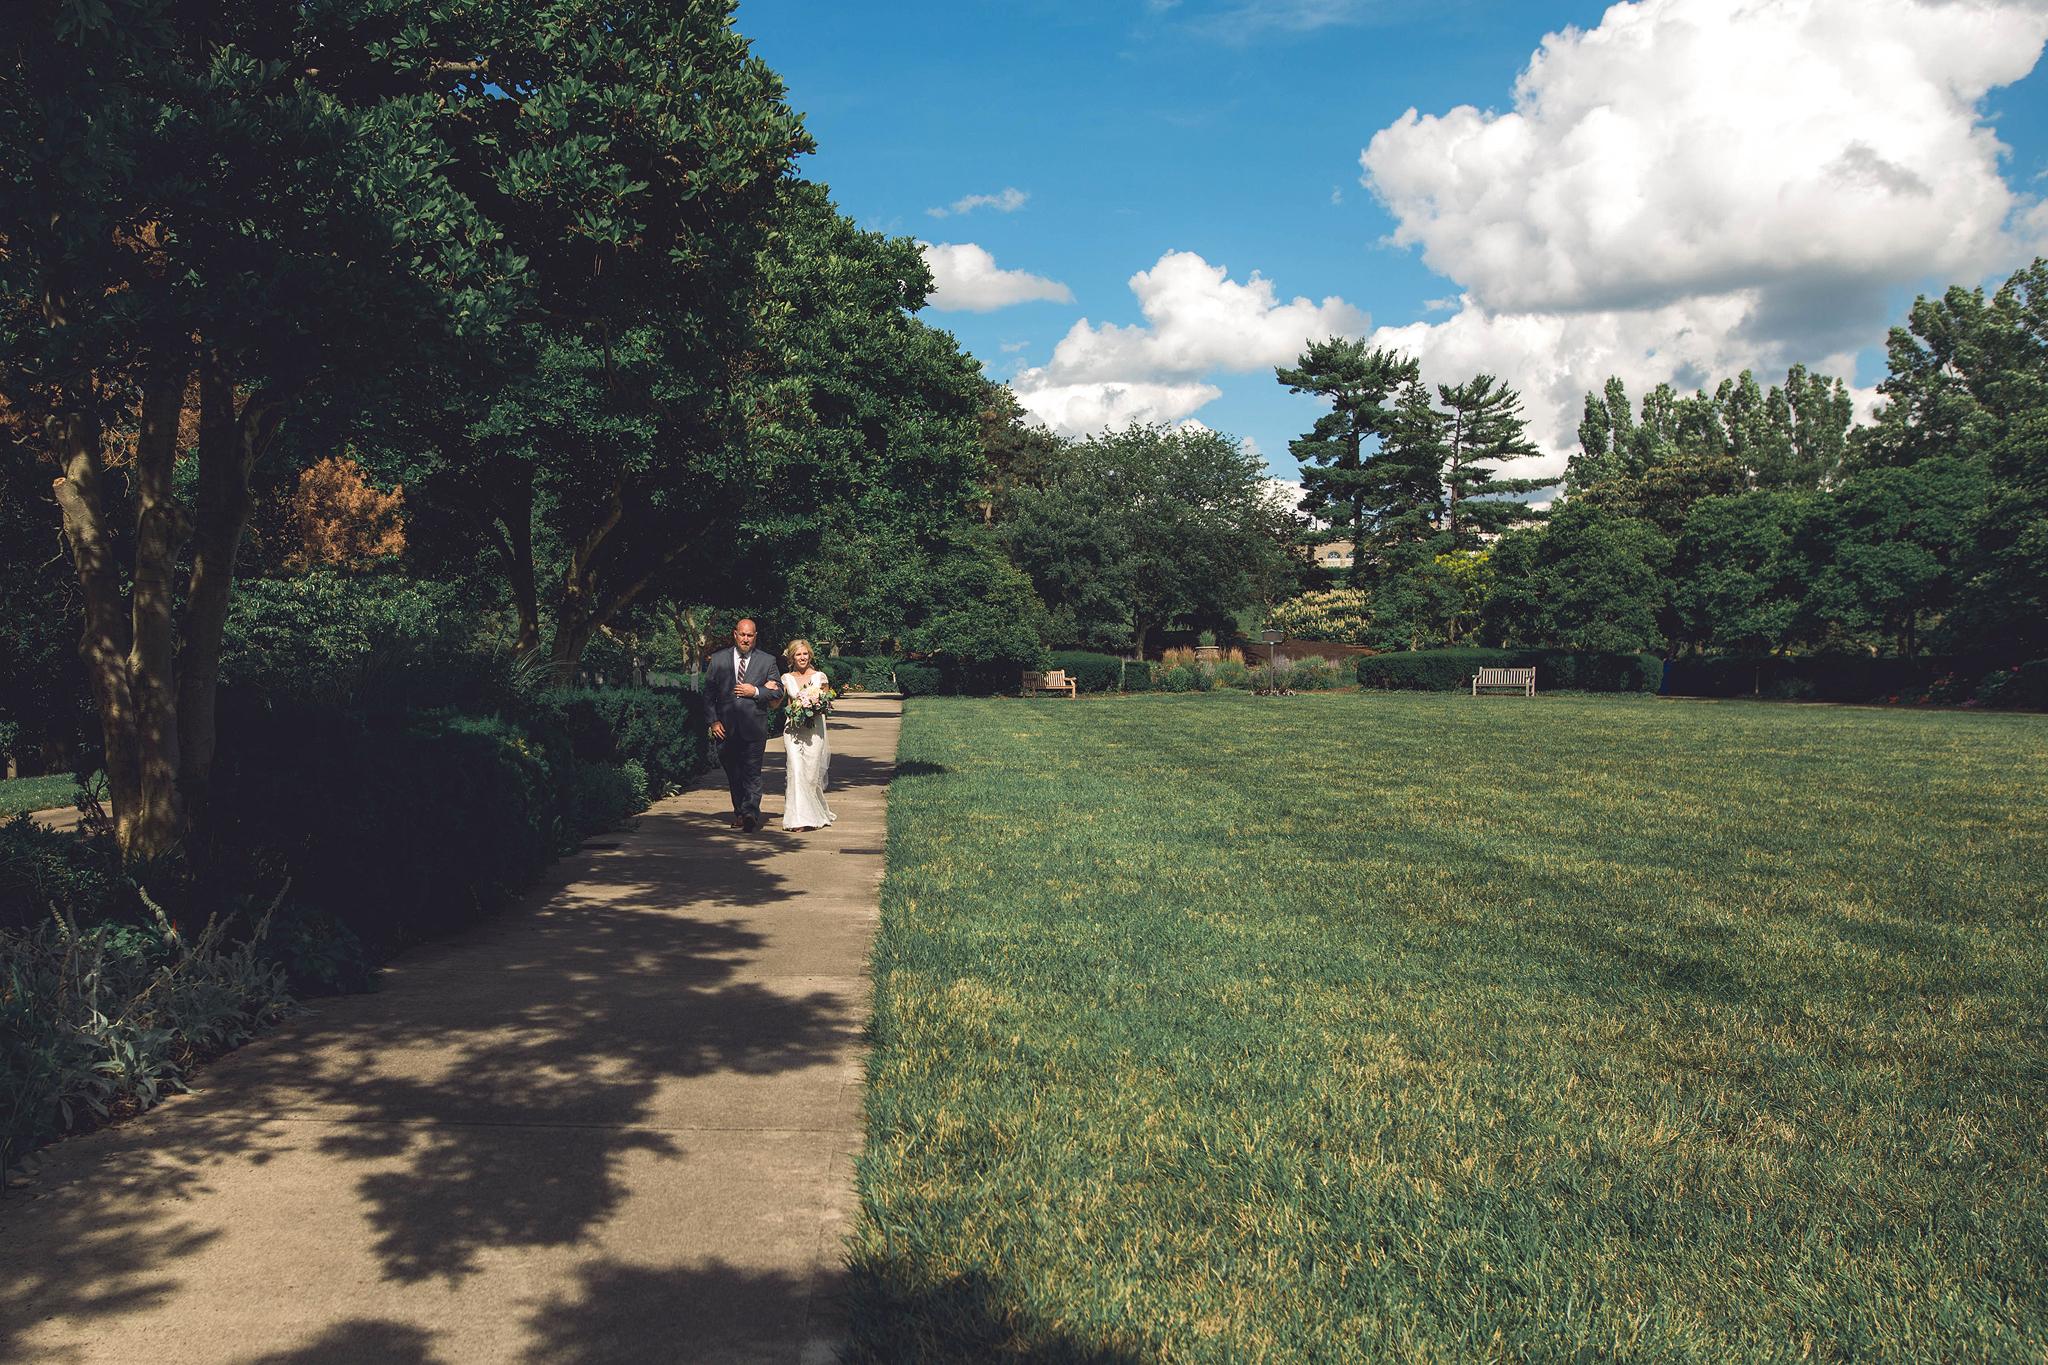 Cincinnati-Dayton-OH-Traveling-Wedding-Photographer-Rhinegeist-Brewery-Ault-Park-21C-88.jpg